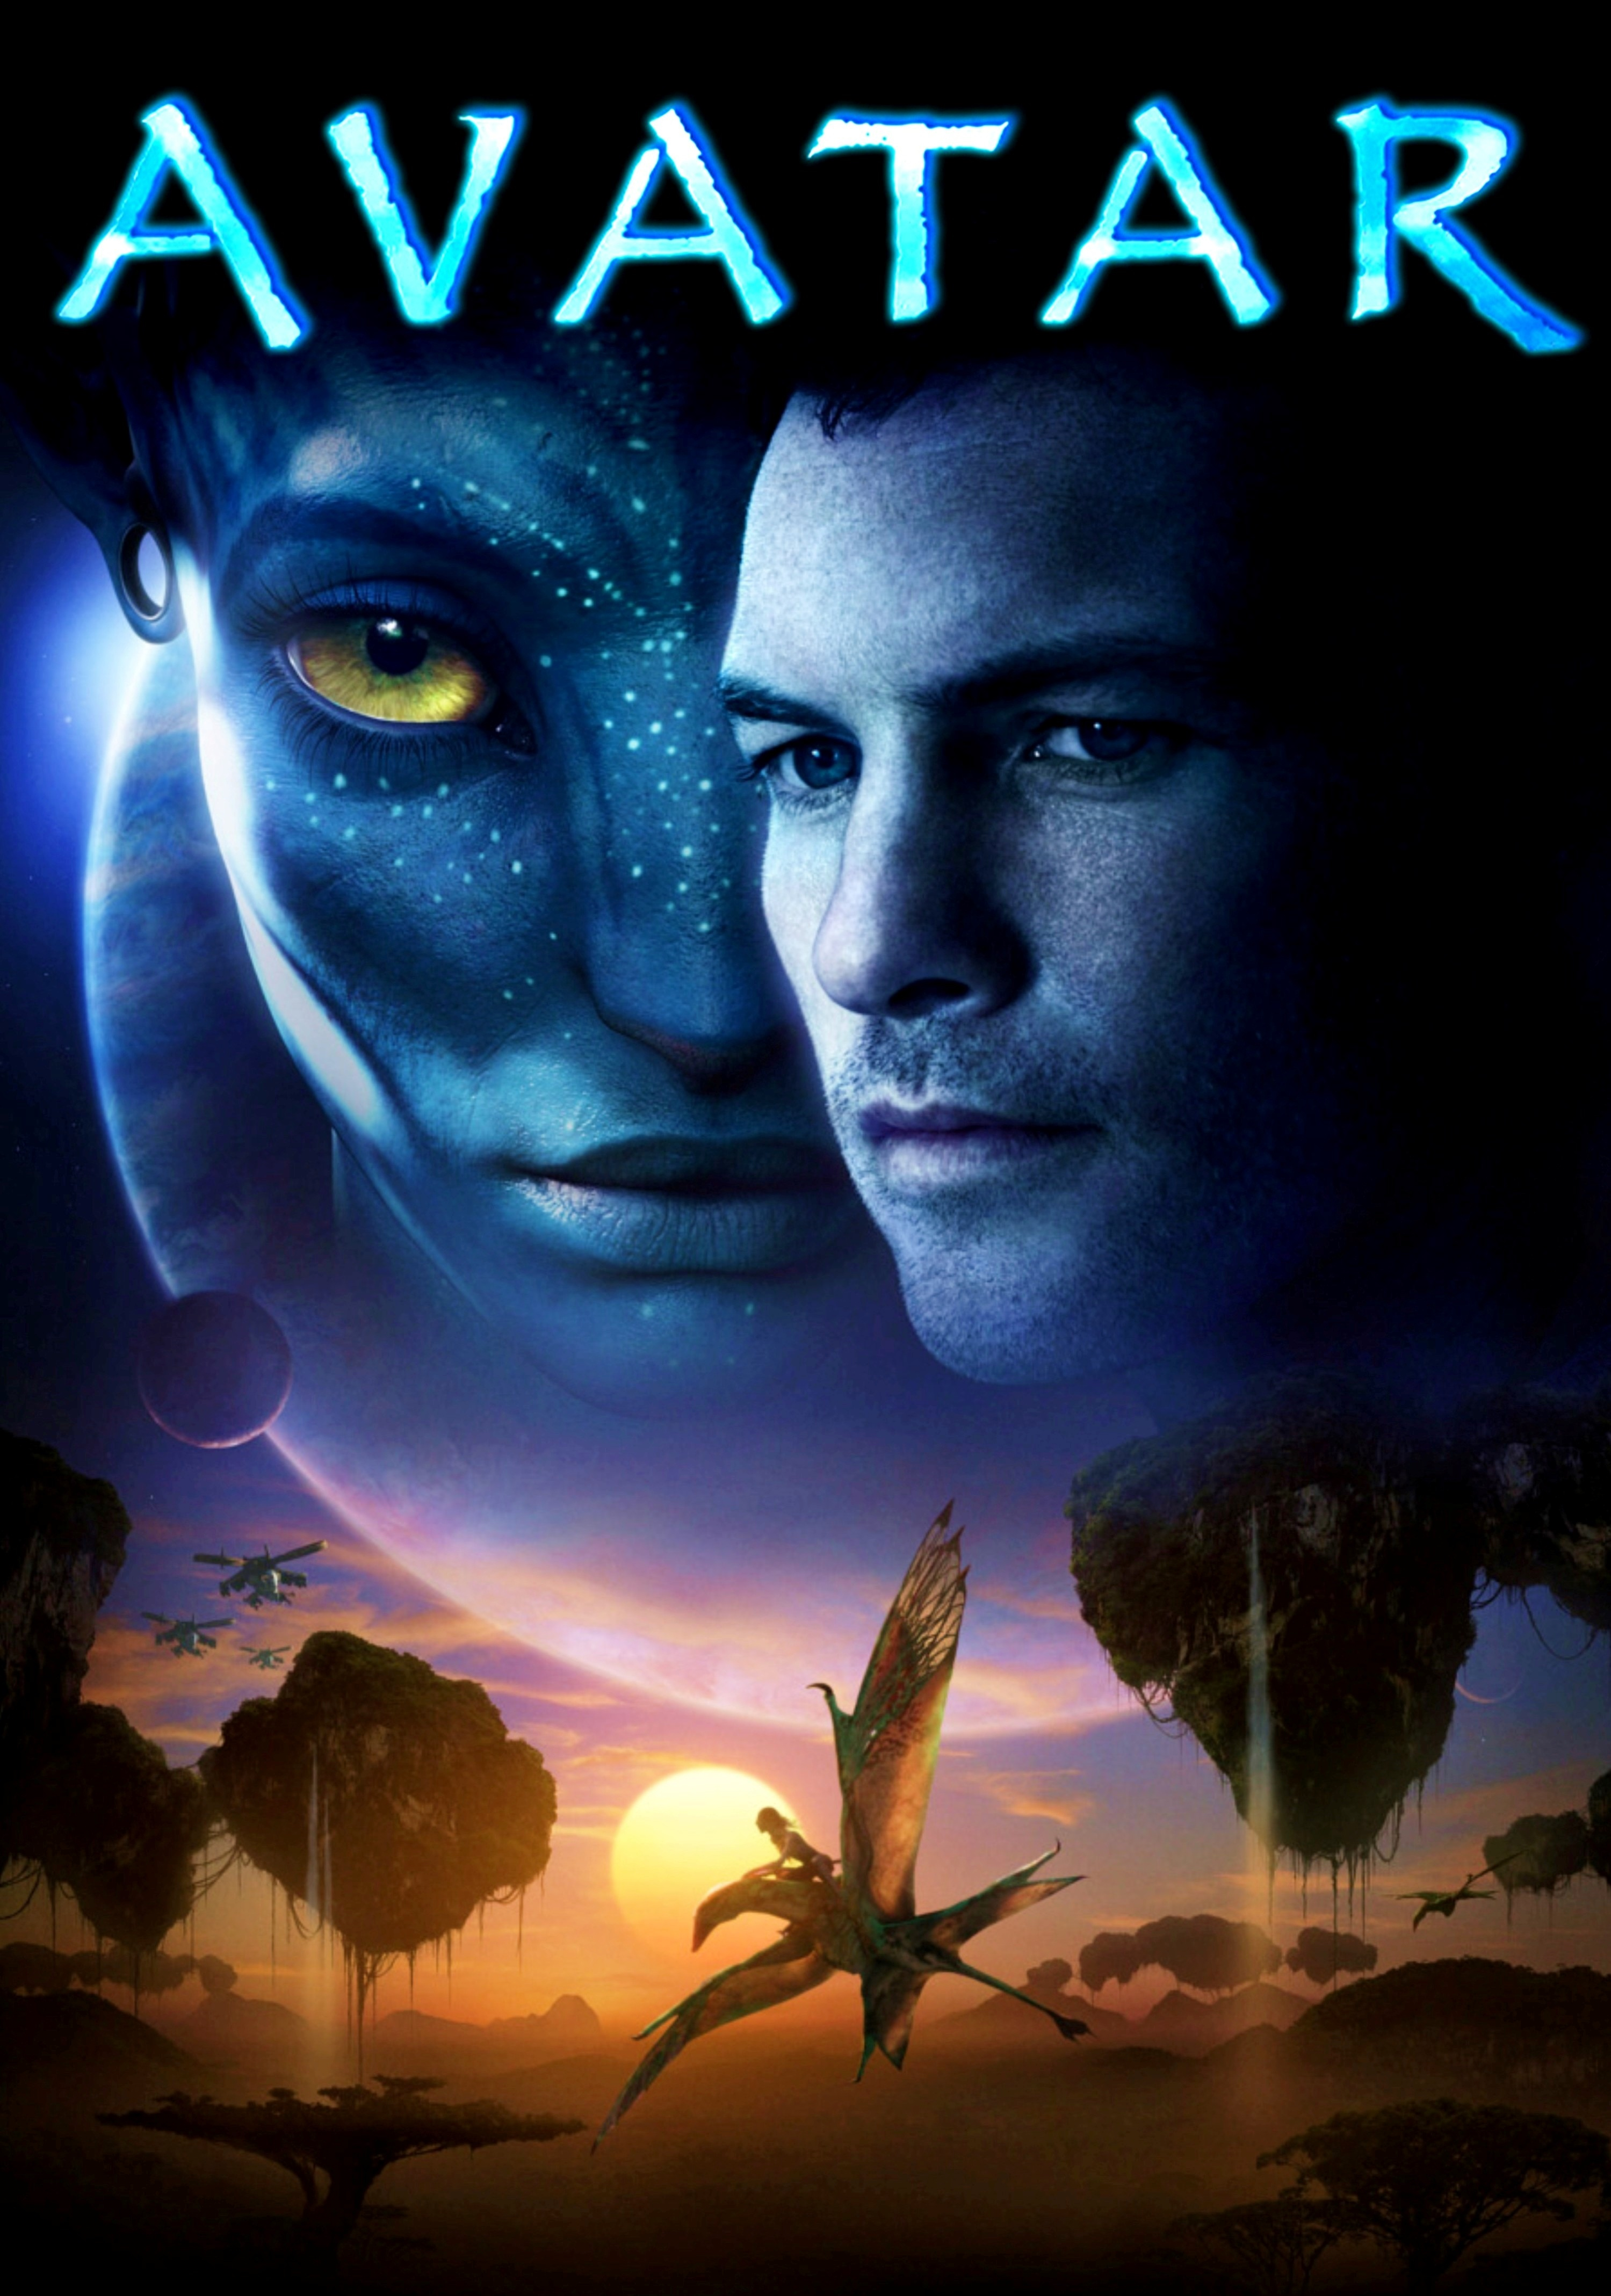 Avatar Dvd Cover Art Chris Conway Art